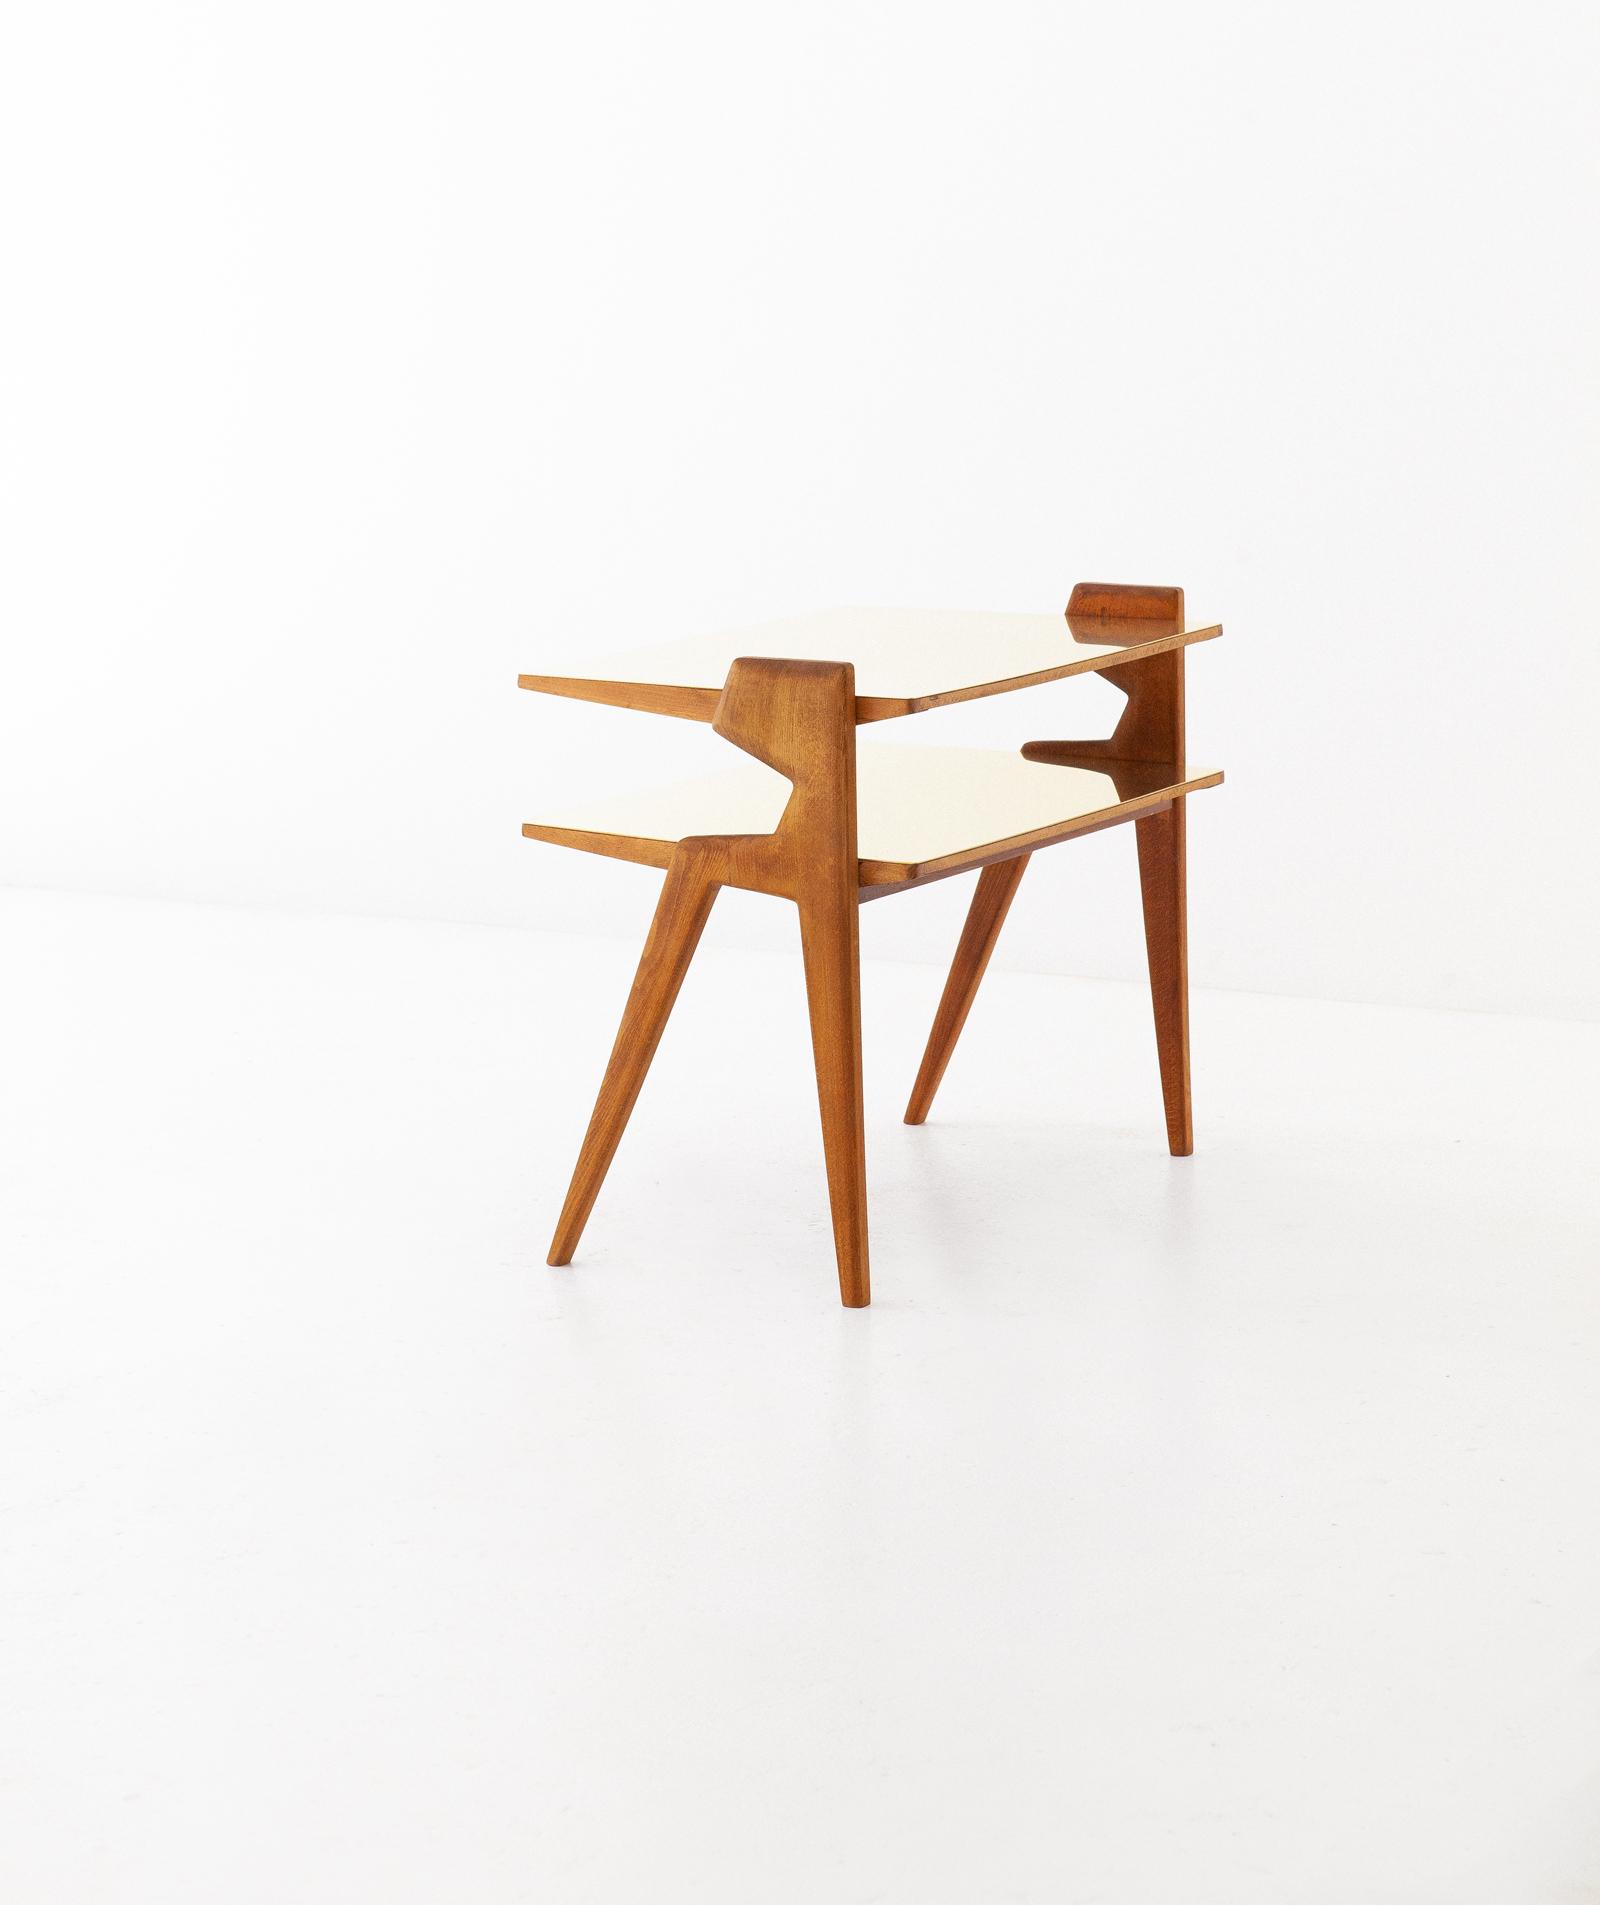 1950s-italian-brass-light-wood-two-levels-side-table-8-t81